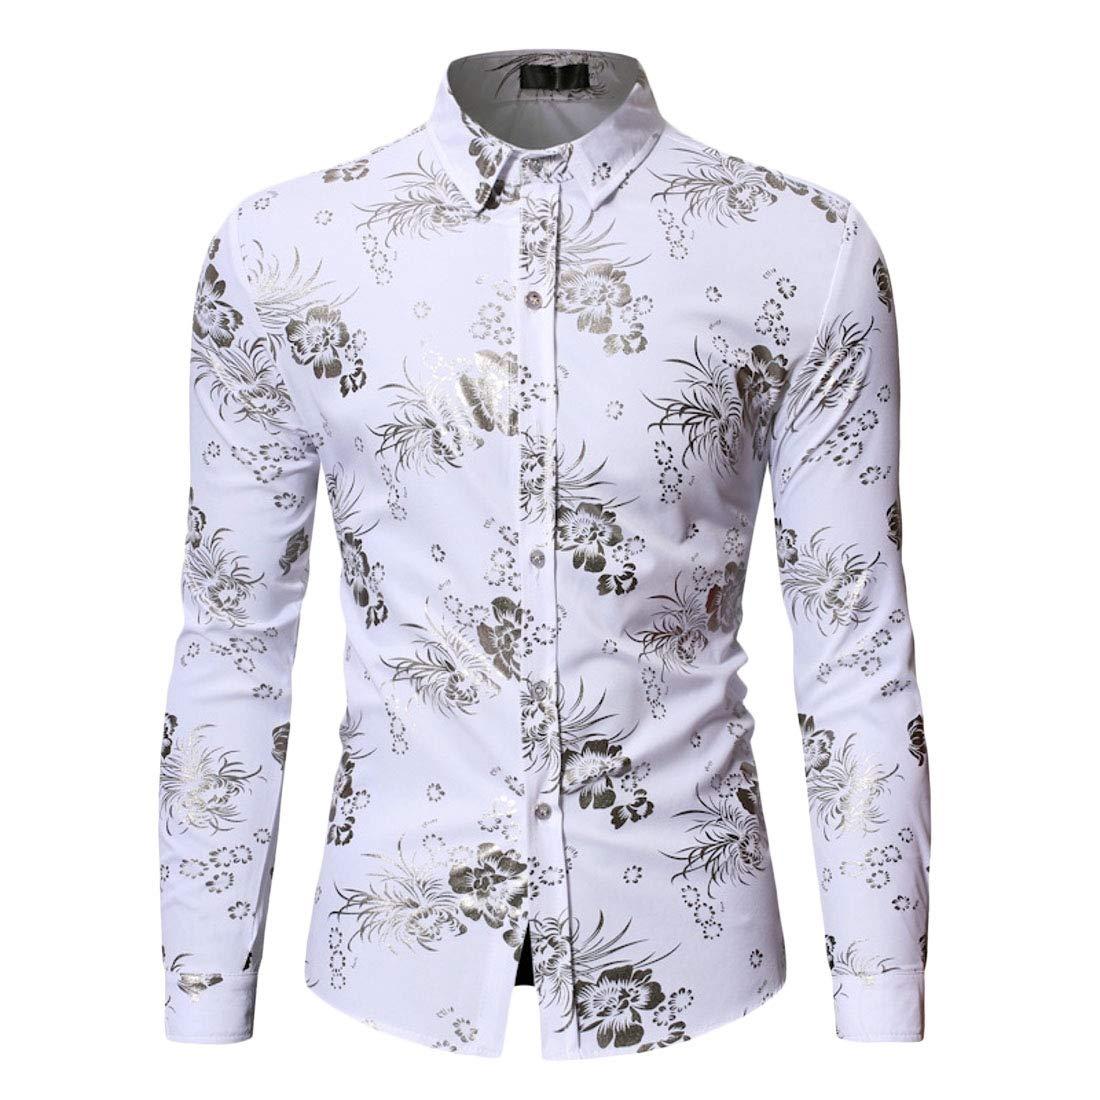 OTW Mens Gilding Long Sleeve Plus Size Slim Fit Print Button Up Dress Work Shirt